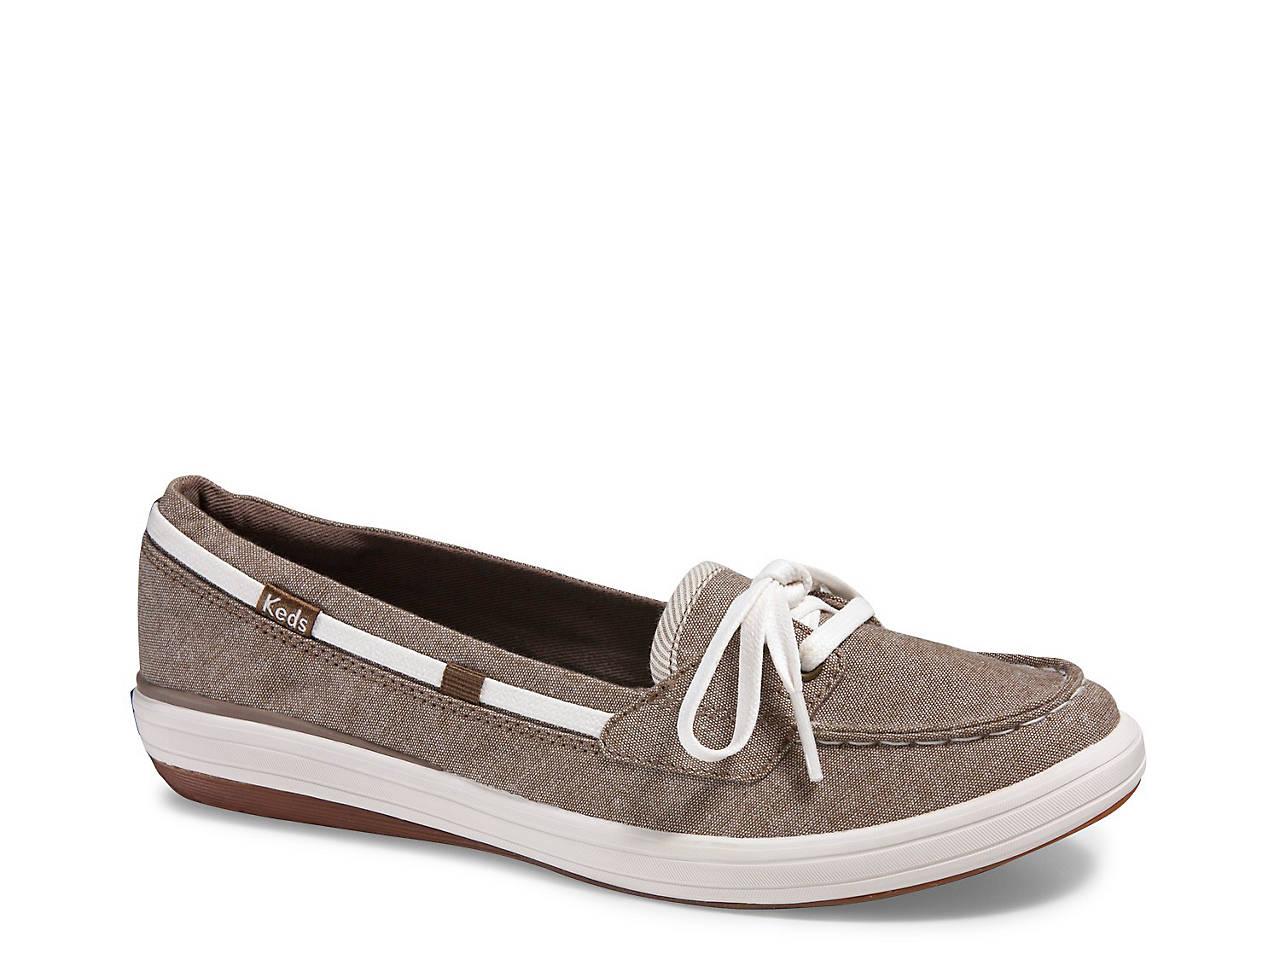 super popular c45c8 31546 Keds Glimmer Boat Chambray Boat Shoe - Women s Women s Shoes   DSW